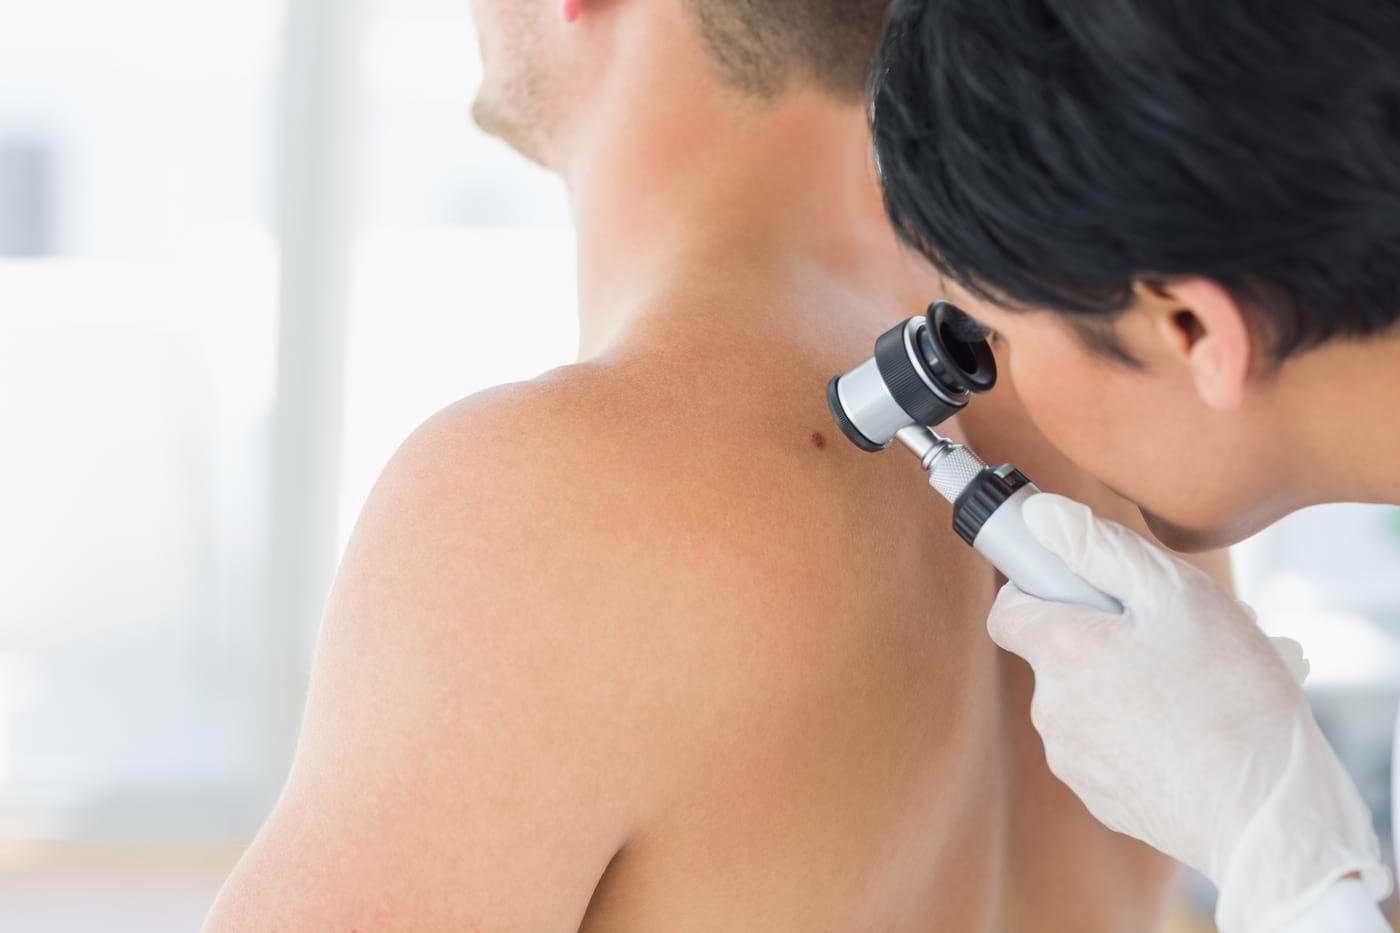 Dermatofibrosarcom protuberans: simptome, cauze, tratament